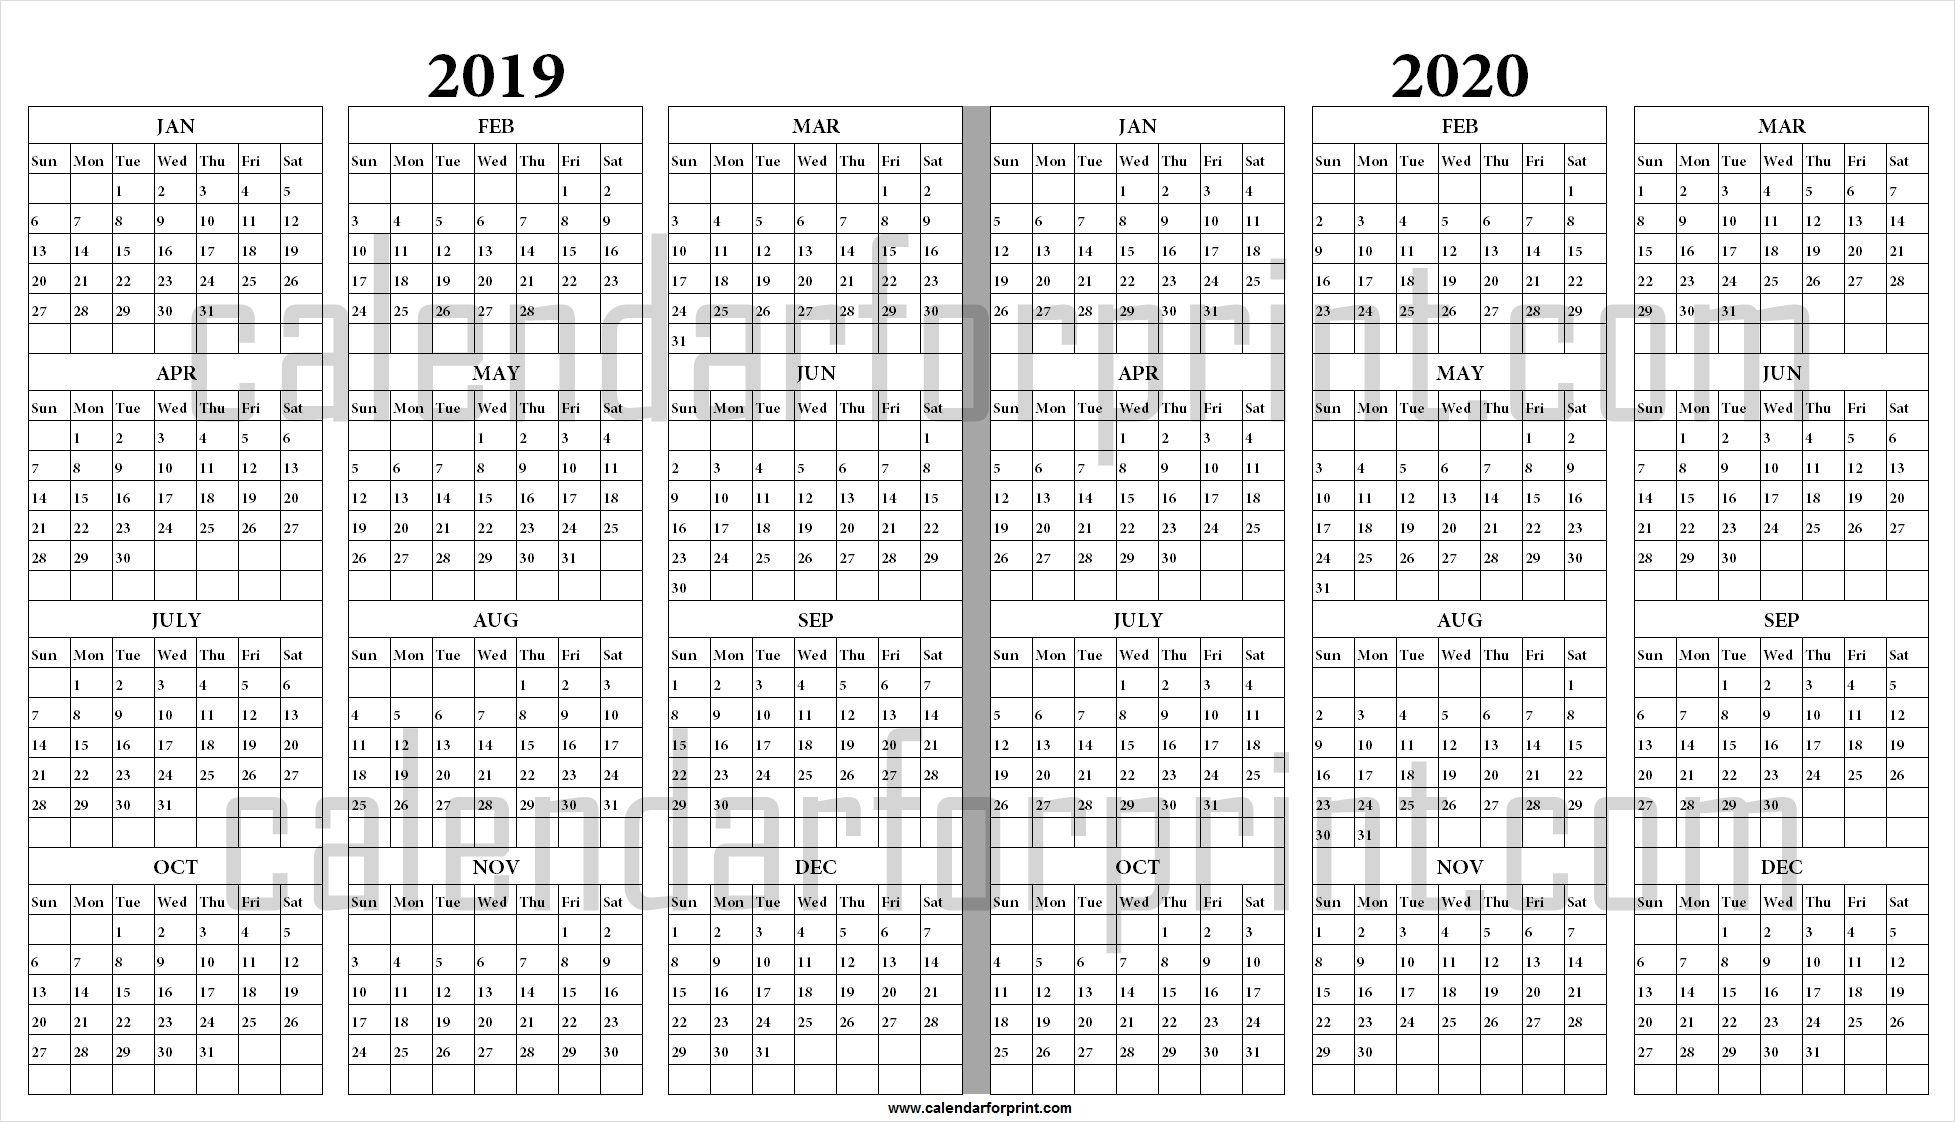 2019 And 2020 Yearly Calendar Printable | 2019 2020 Calendar